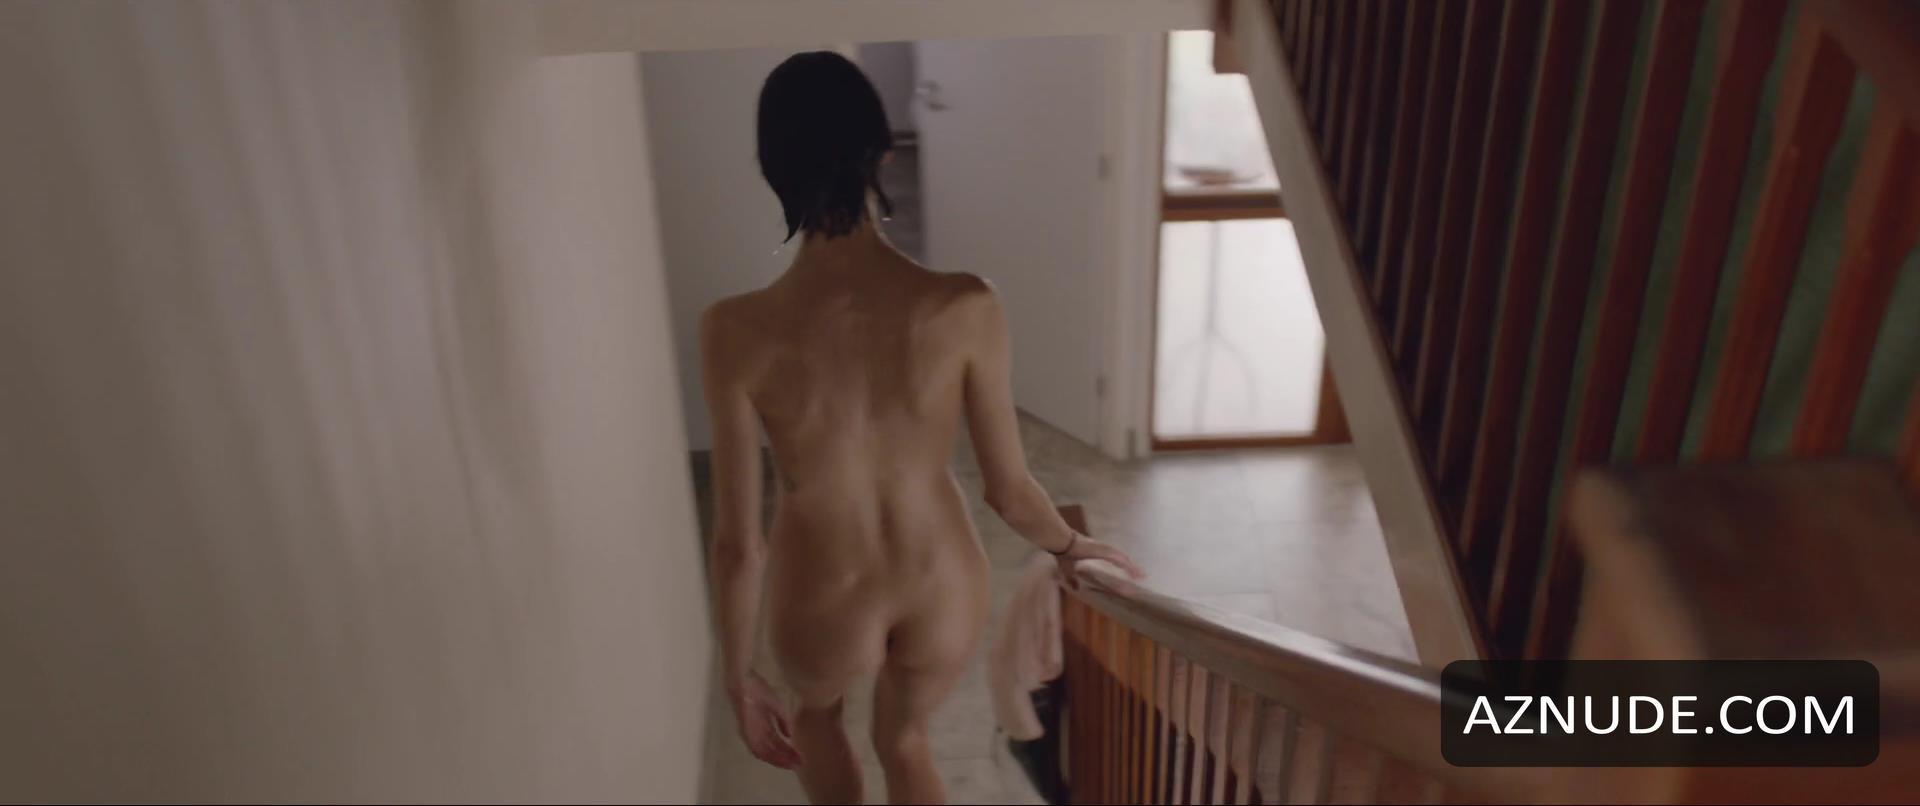 Emma Appleton Topless